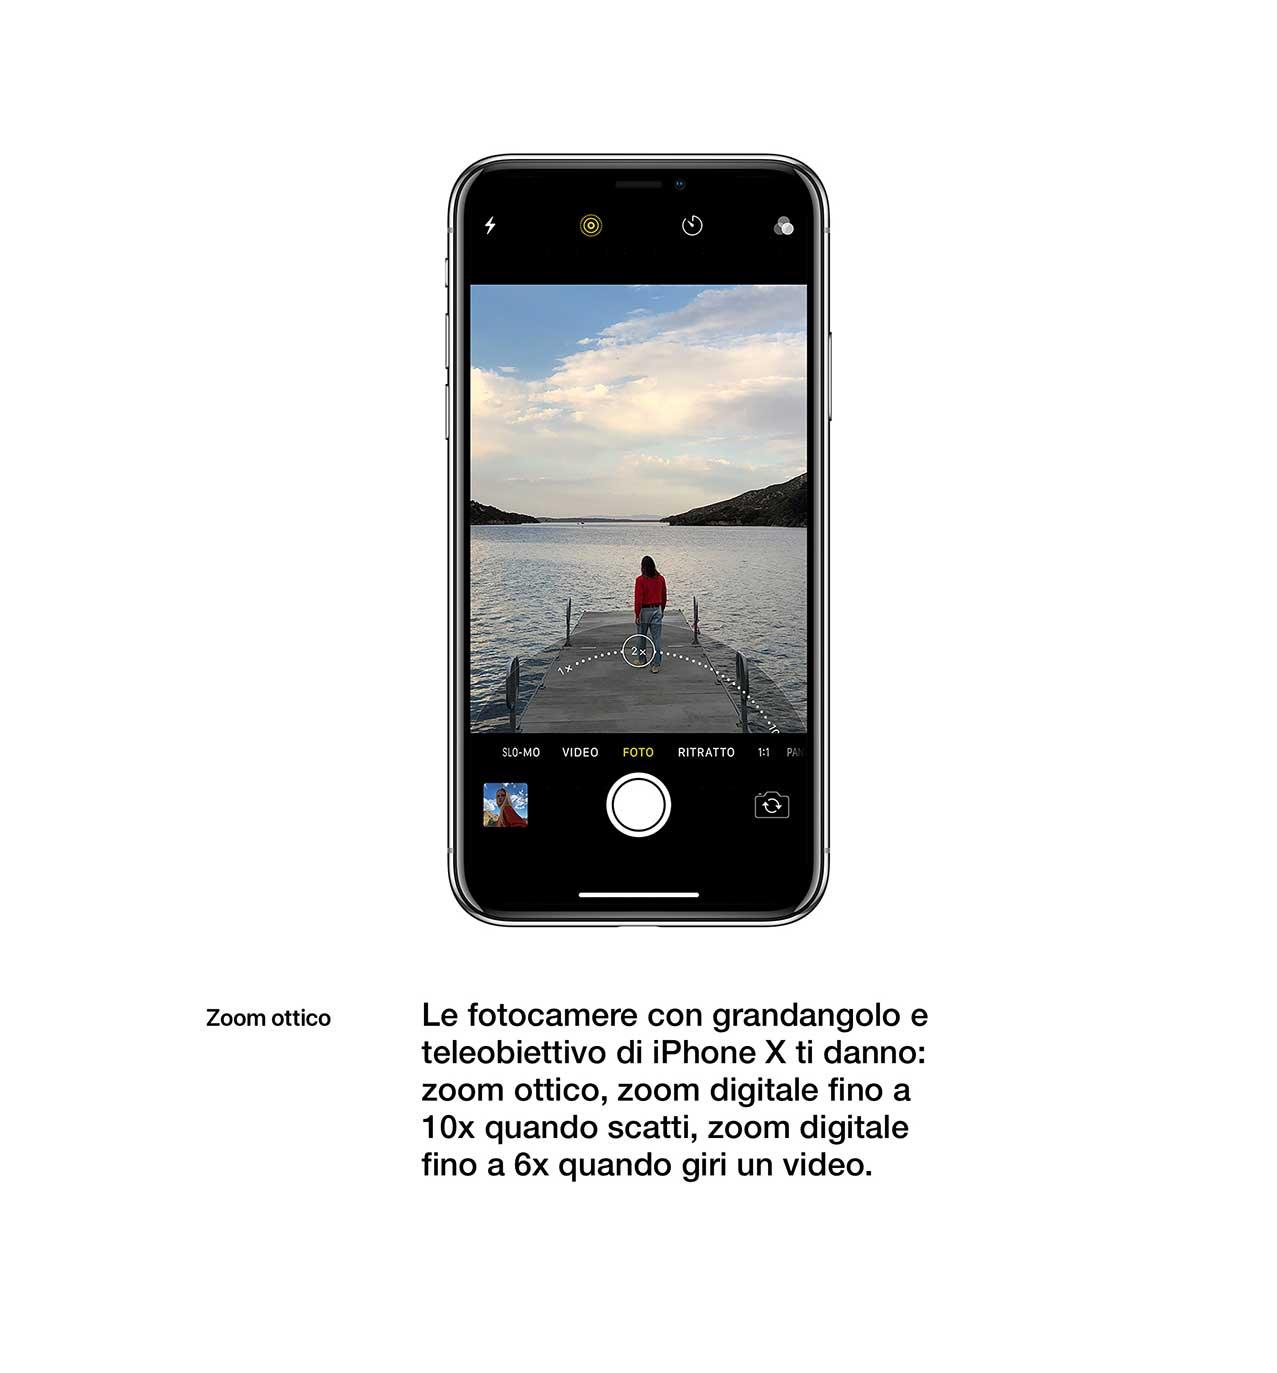 iPhone X fotocamera grandangolo